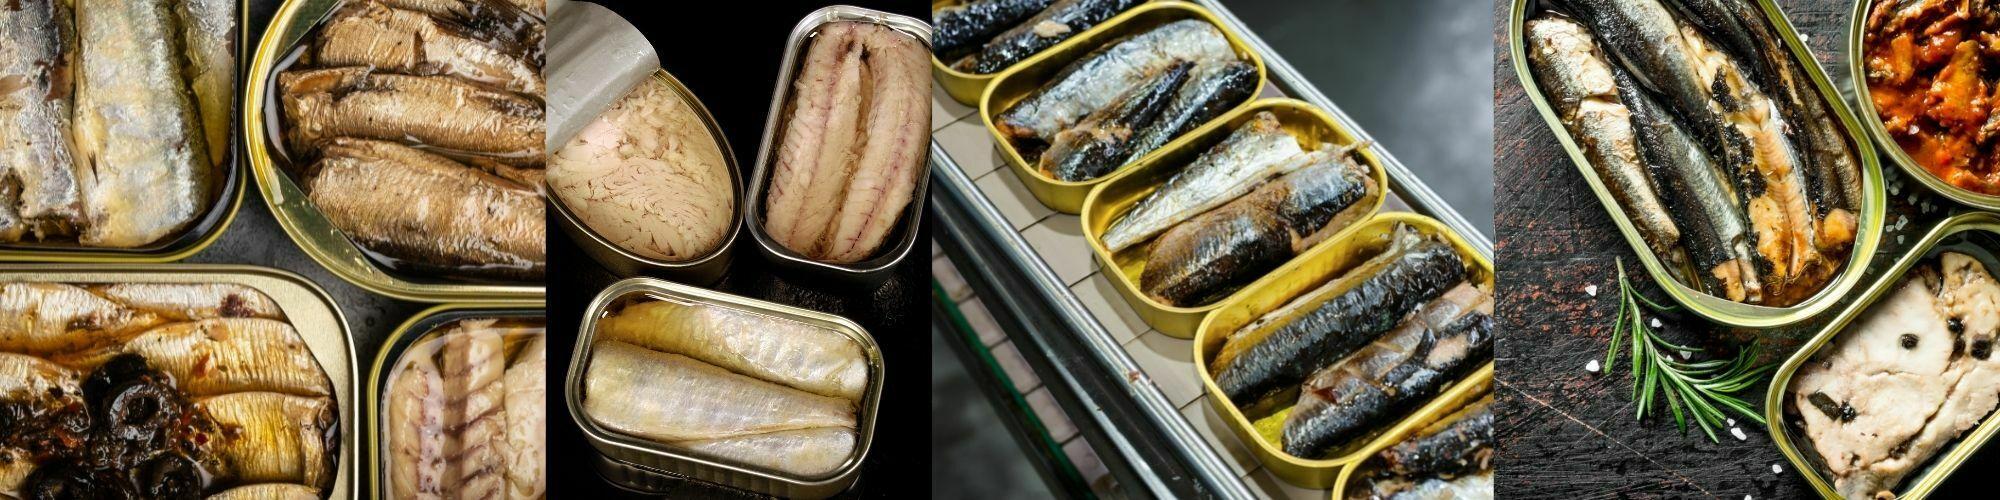 Fish Tins-banner-image